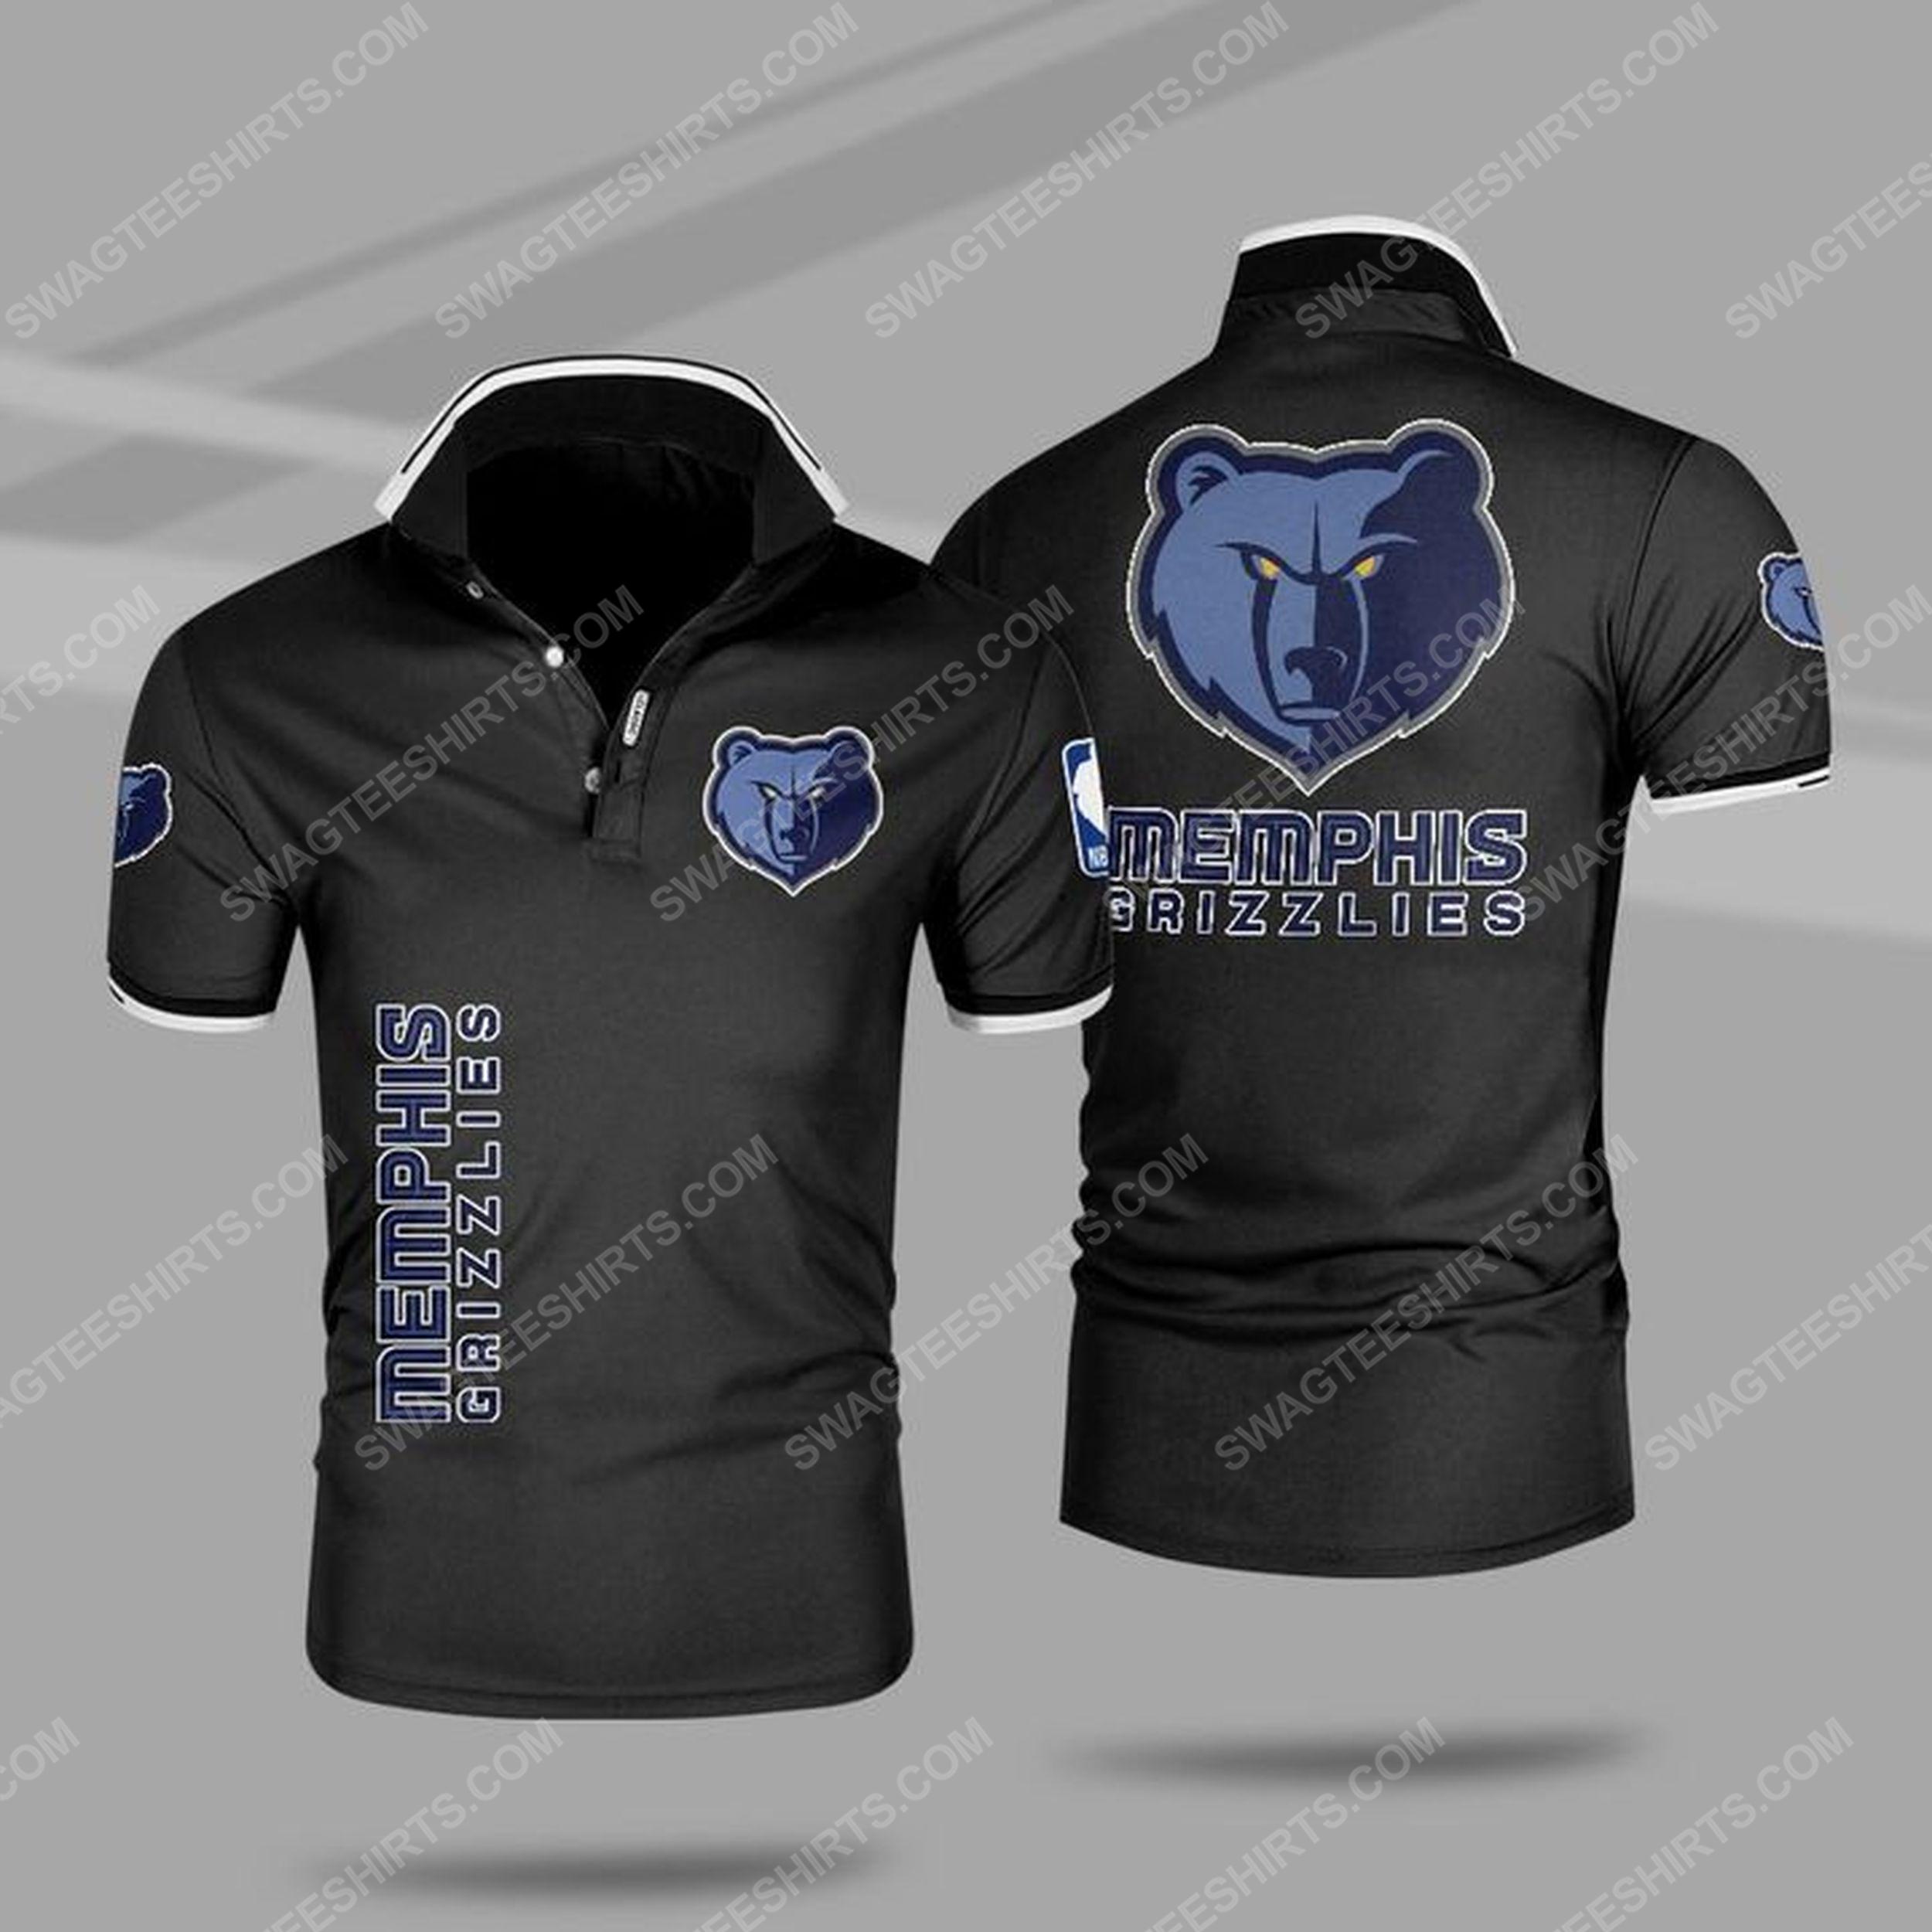 The memphis grizzlies nba all over print polo shirt - black 1